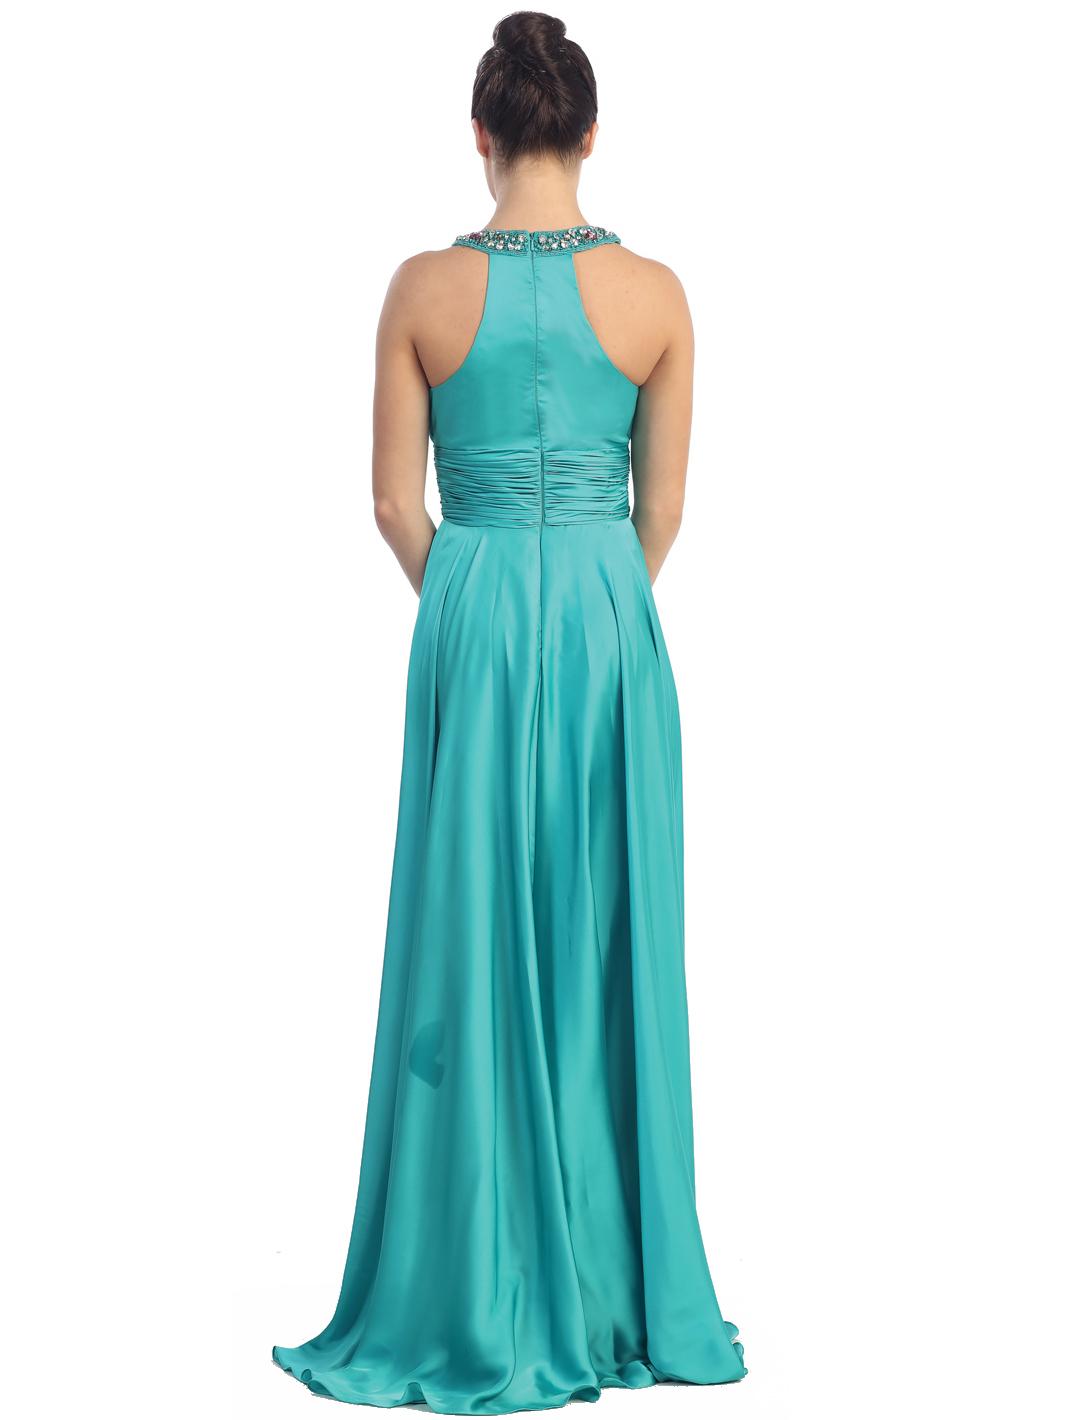 Affordable Wedding Flowers Dallas Tx : Cheap flower girl dresses dallas tx wedding dress s